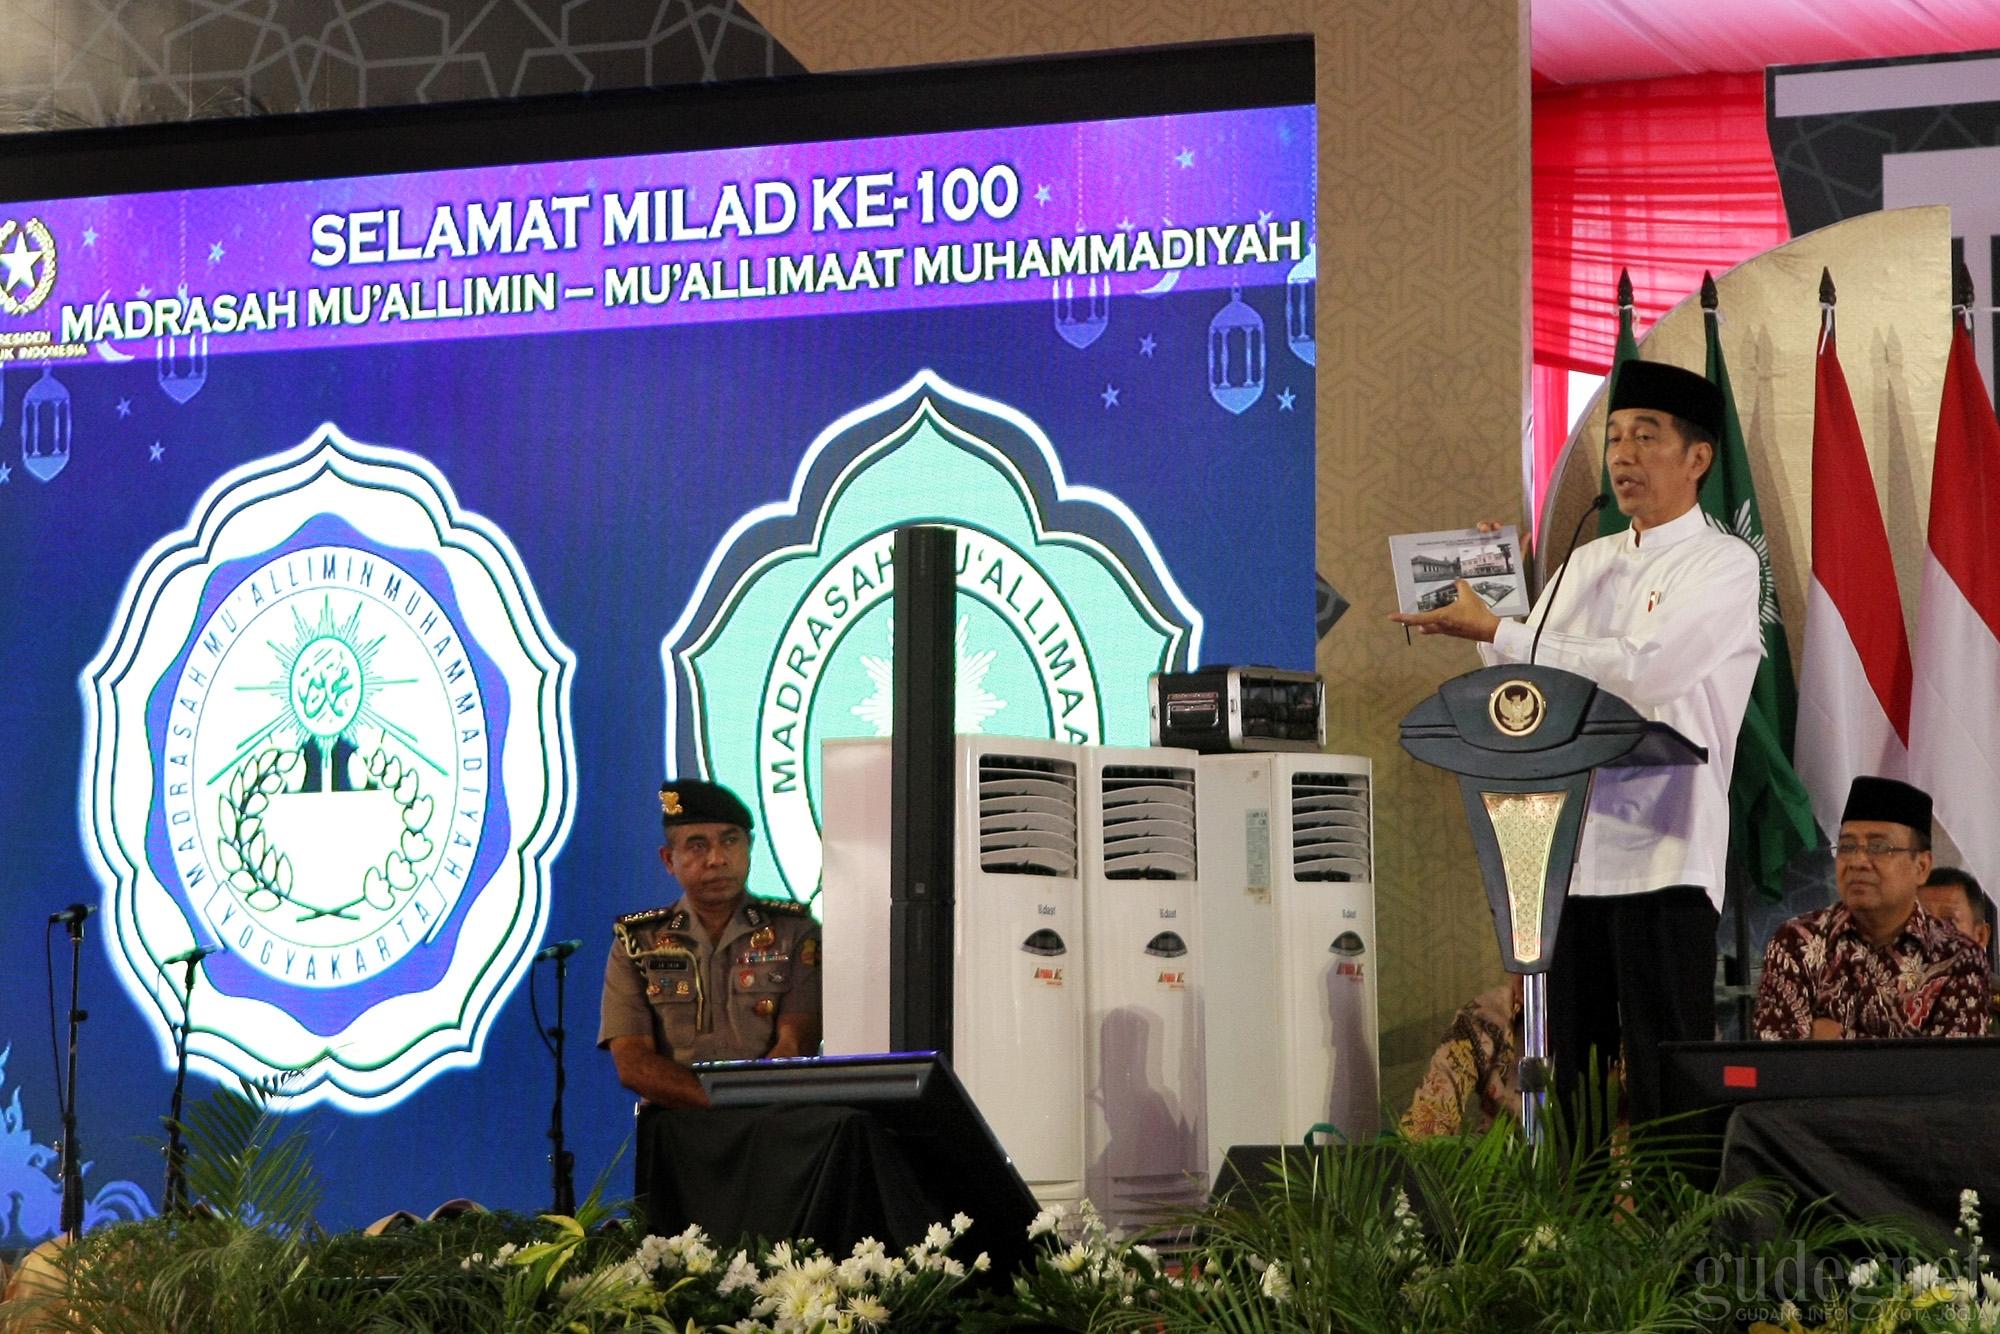 Jokowi Hadiri Milad 1 Abad Muallimin Muallimat